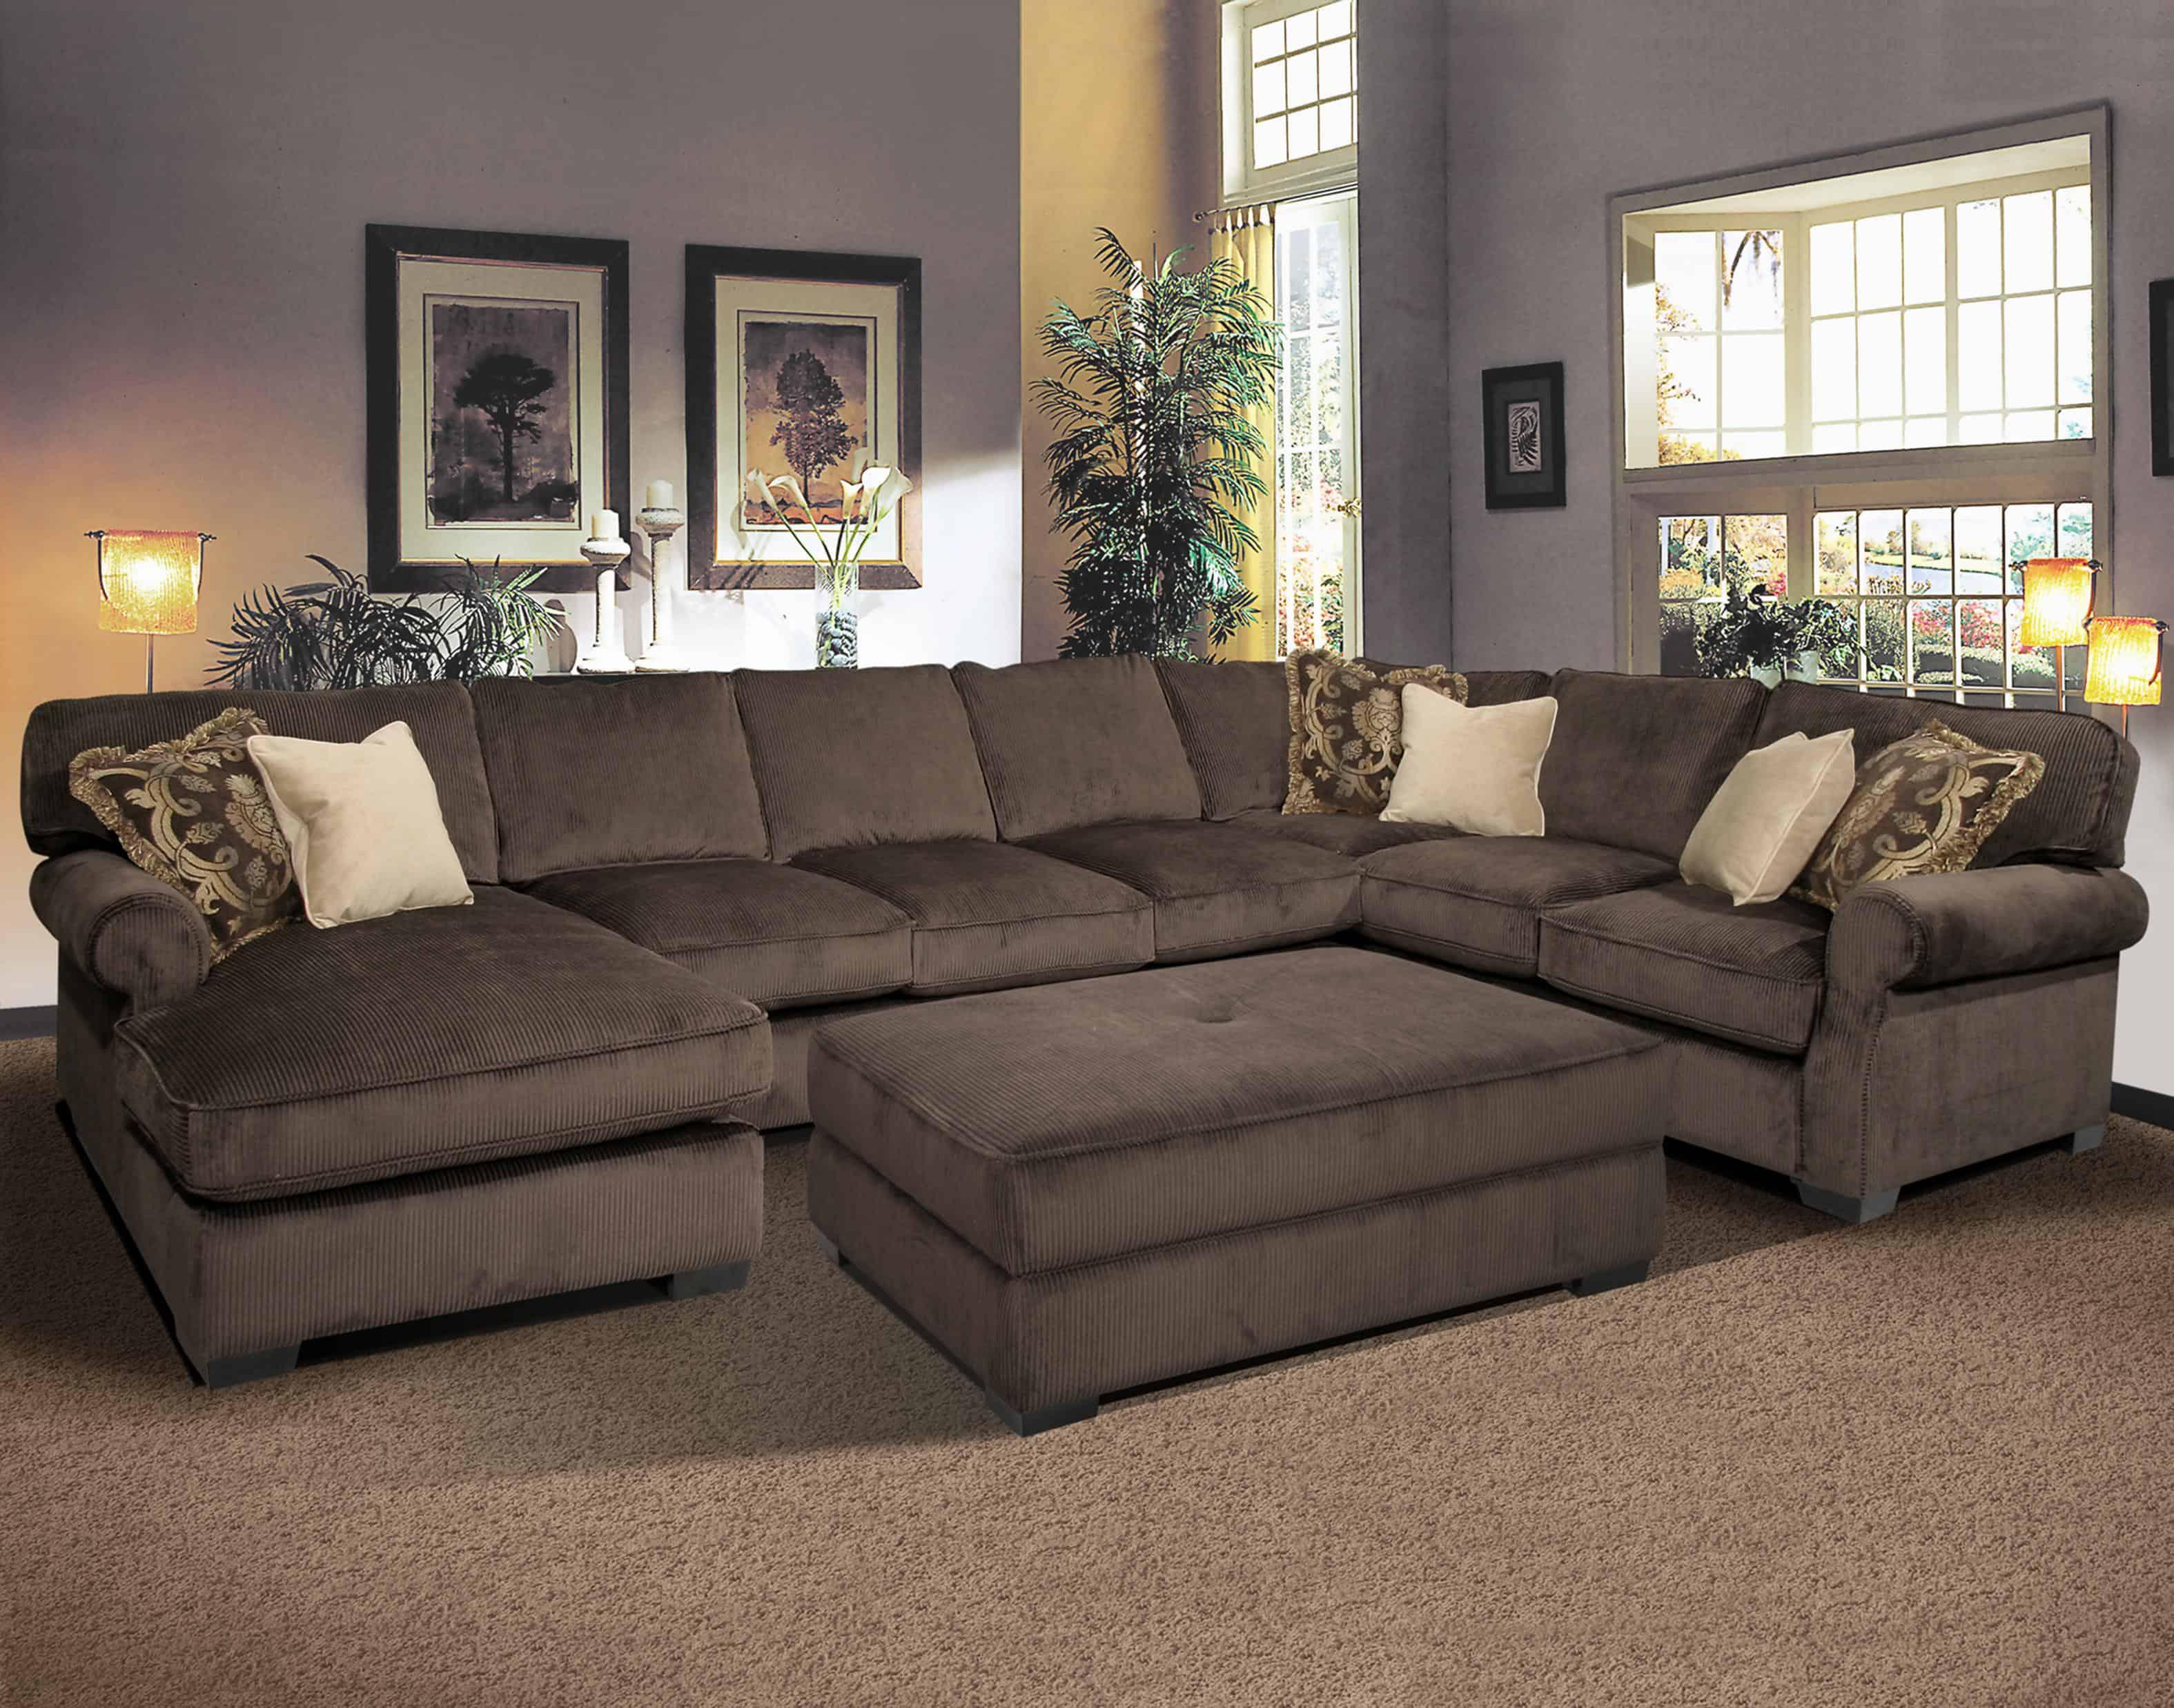 Unseat – living room idea